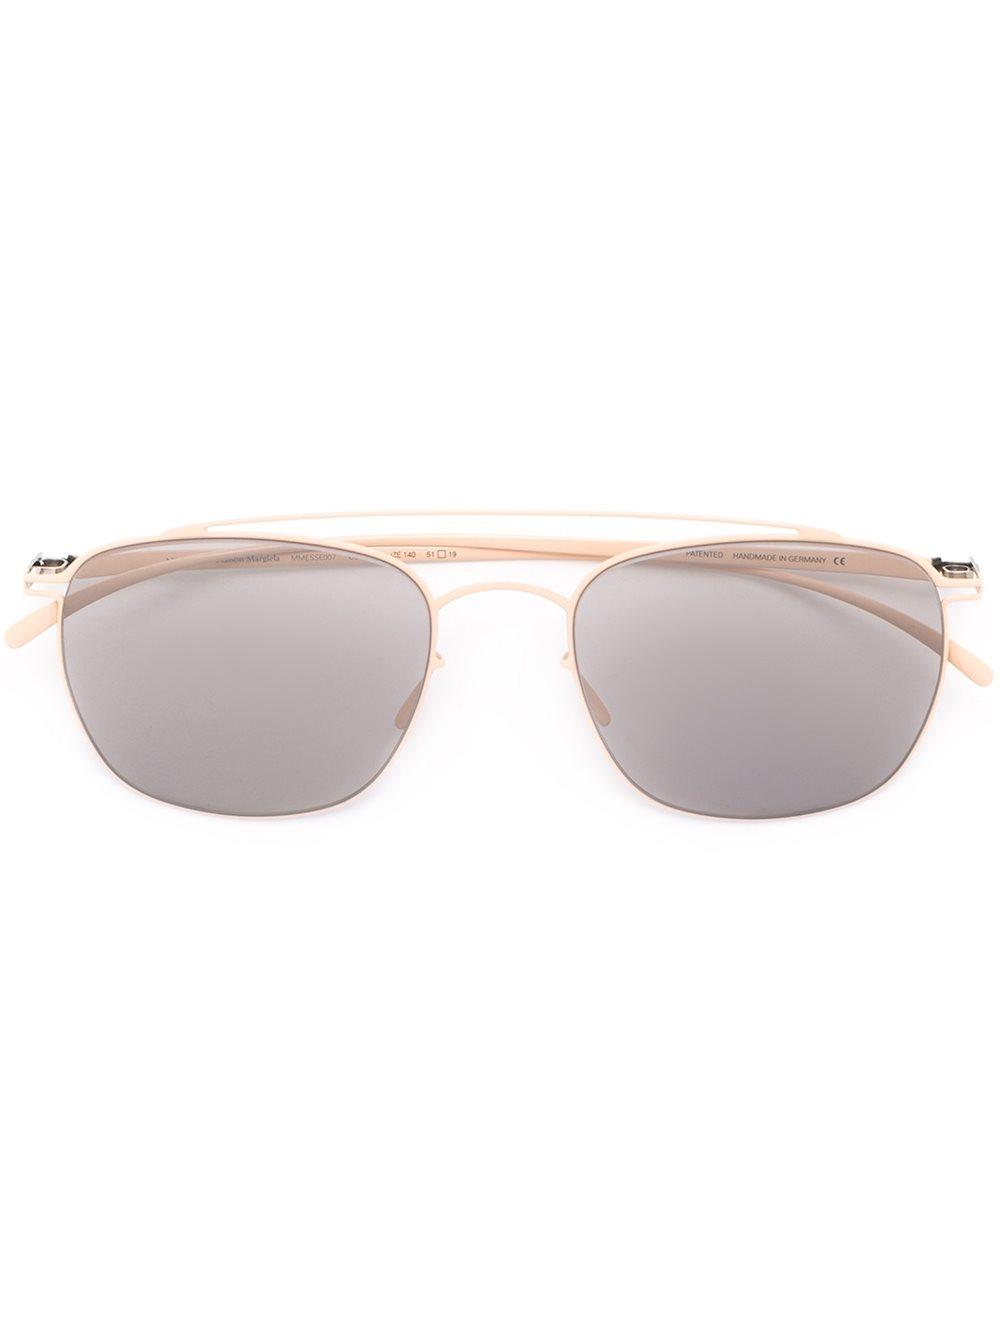 Mykita maison martin margiela x 39 mmesse007 39 sunglasses in for Martin margiela glasses